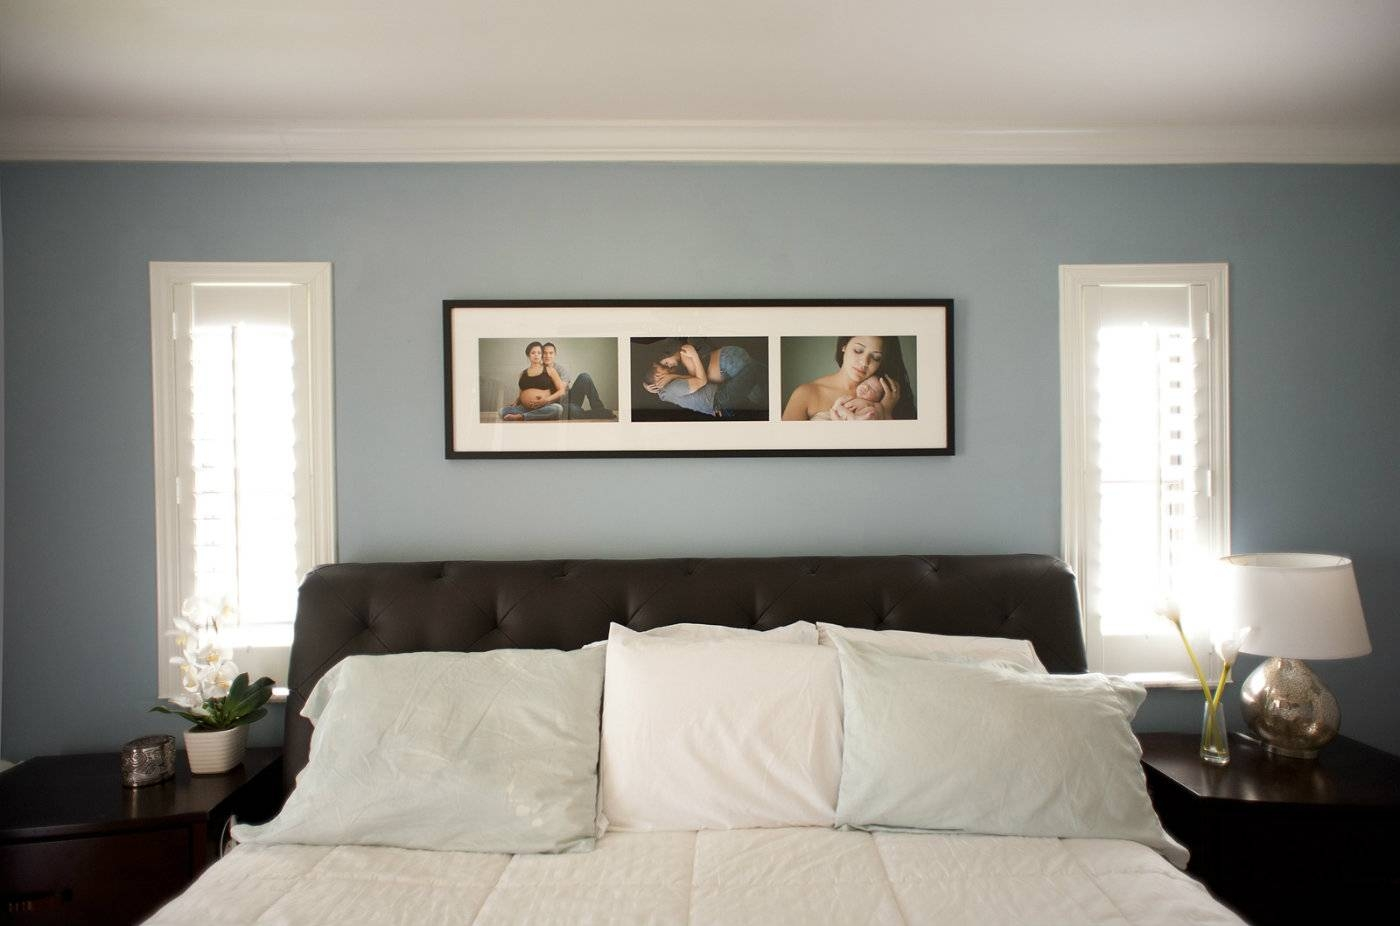 20 The Best Bedroom Framed Wall Art